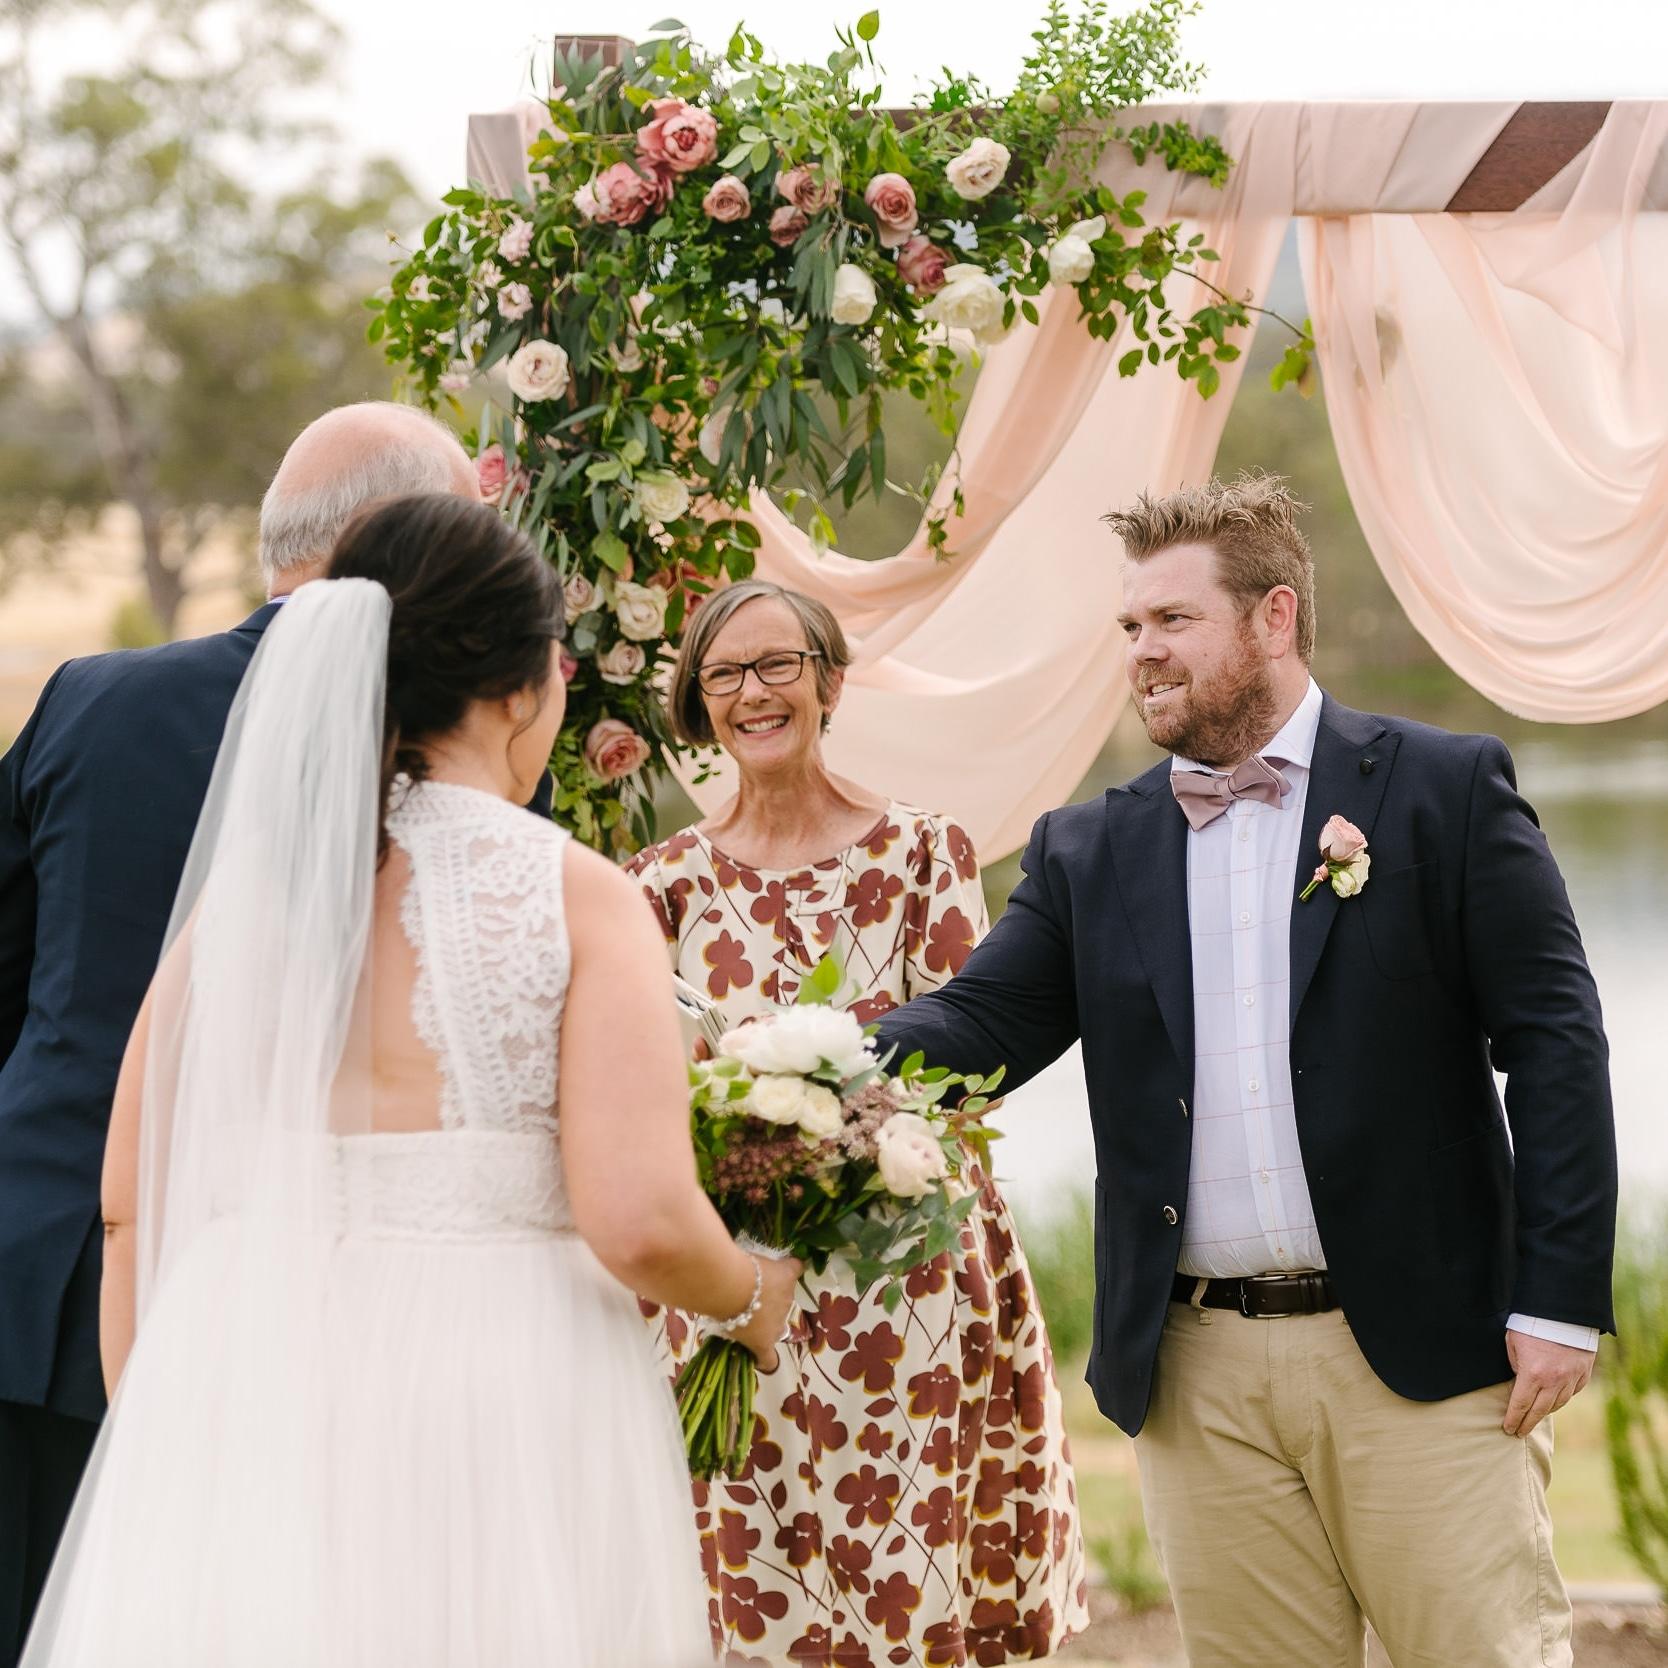 Image: Justin & Jim Photographers, Sutton Grange Winery wedding